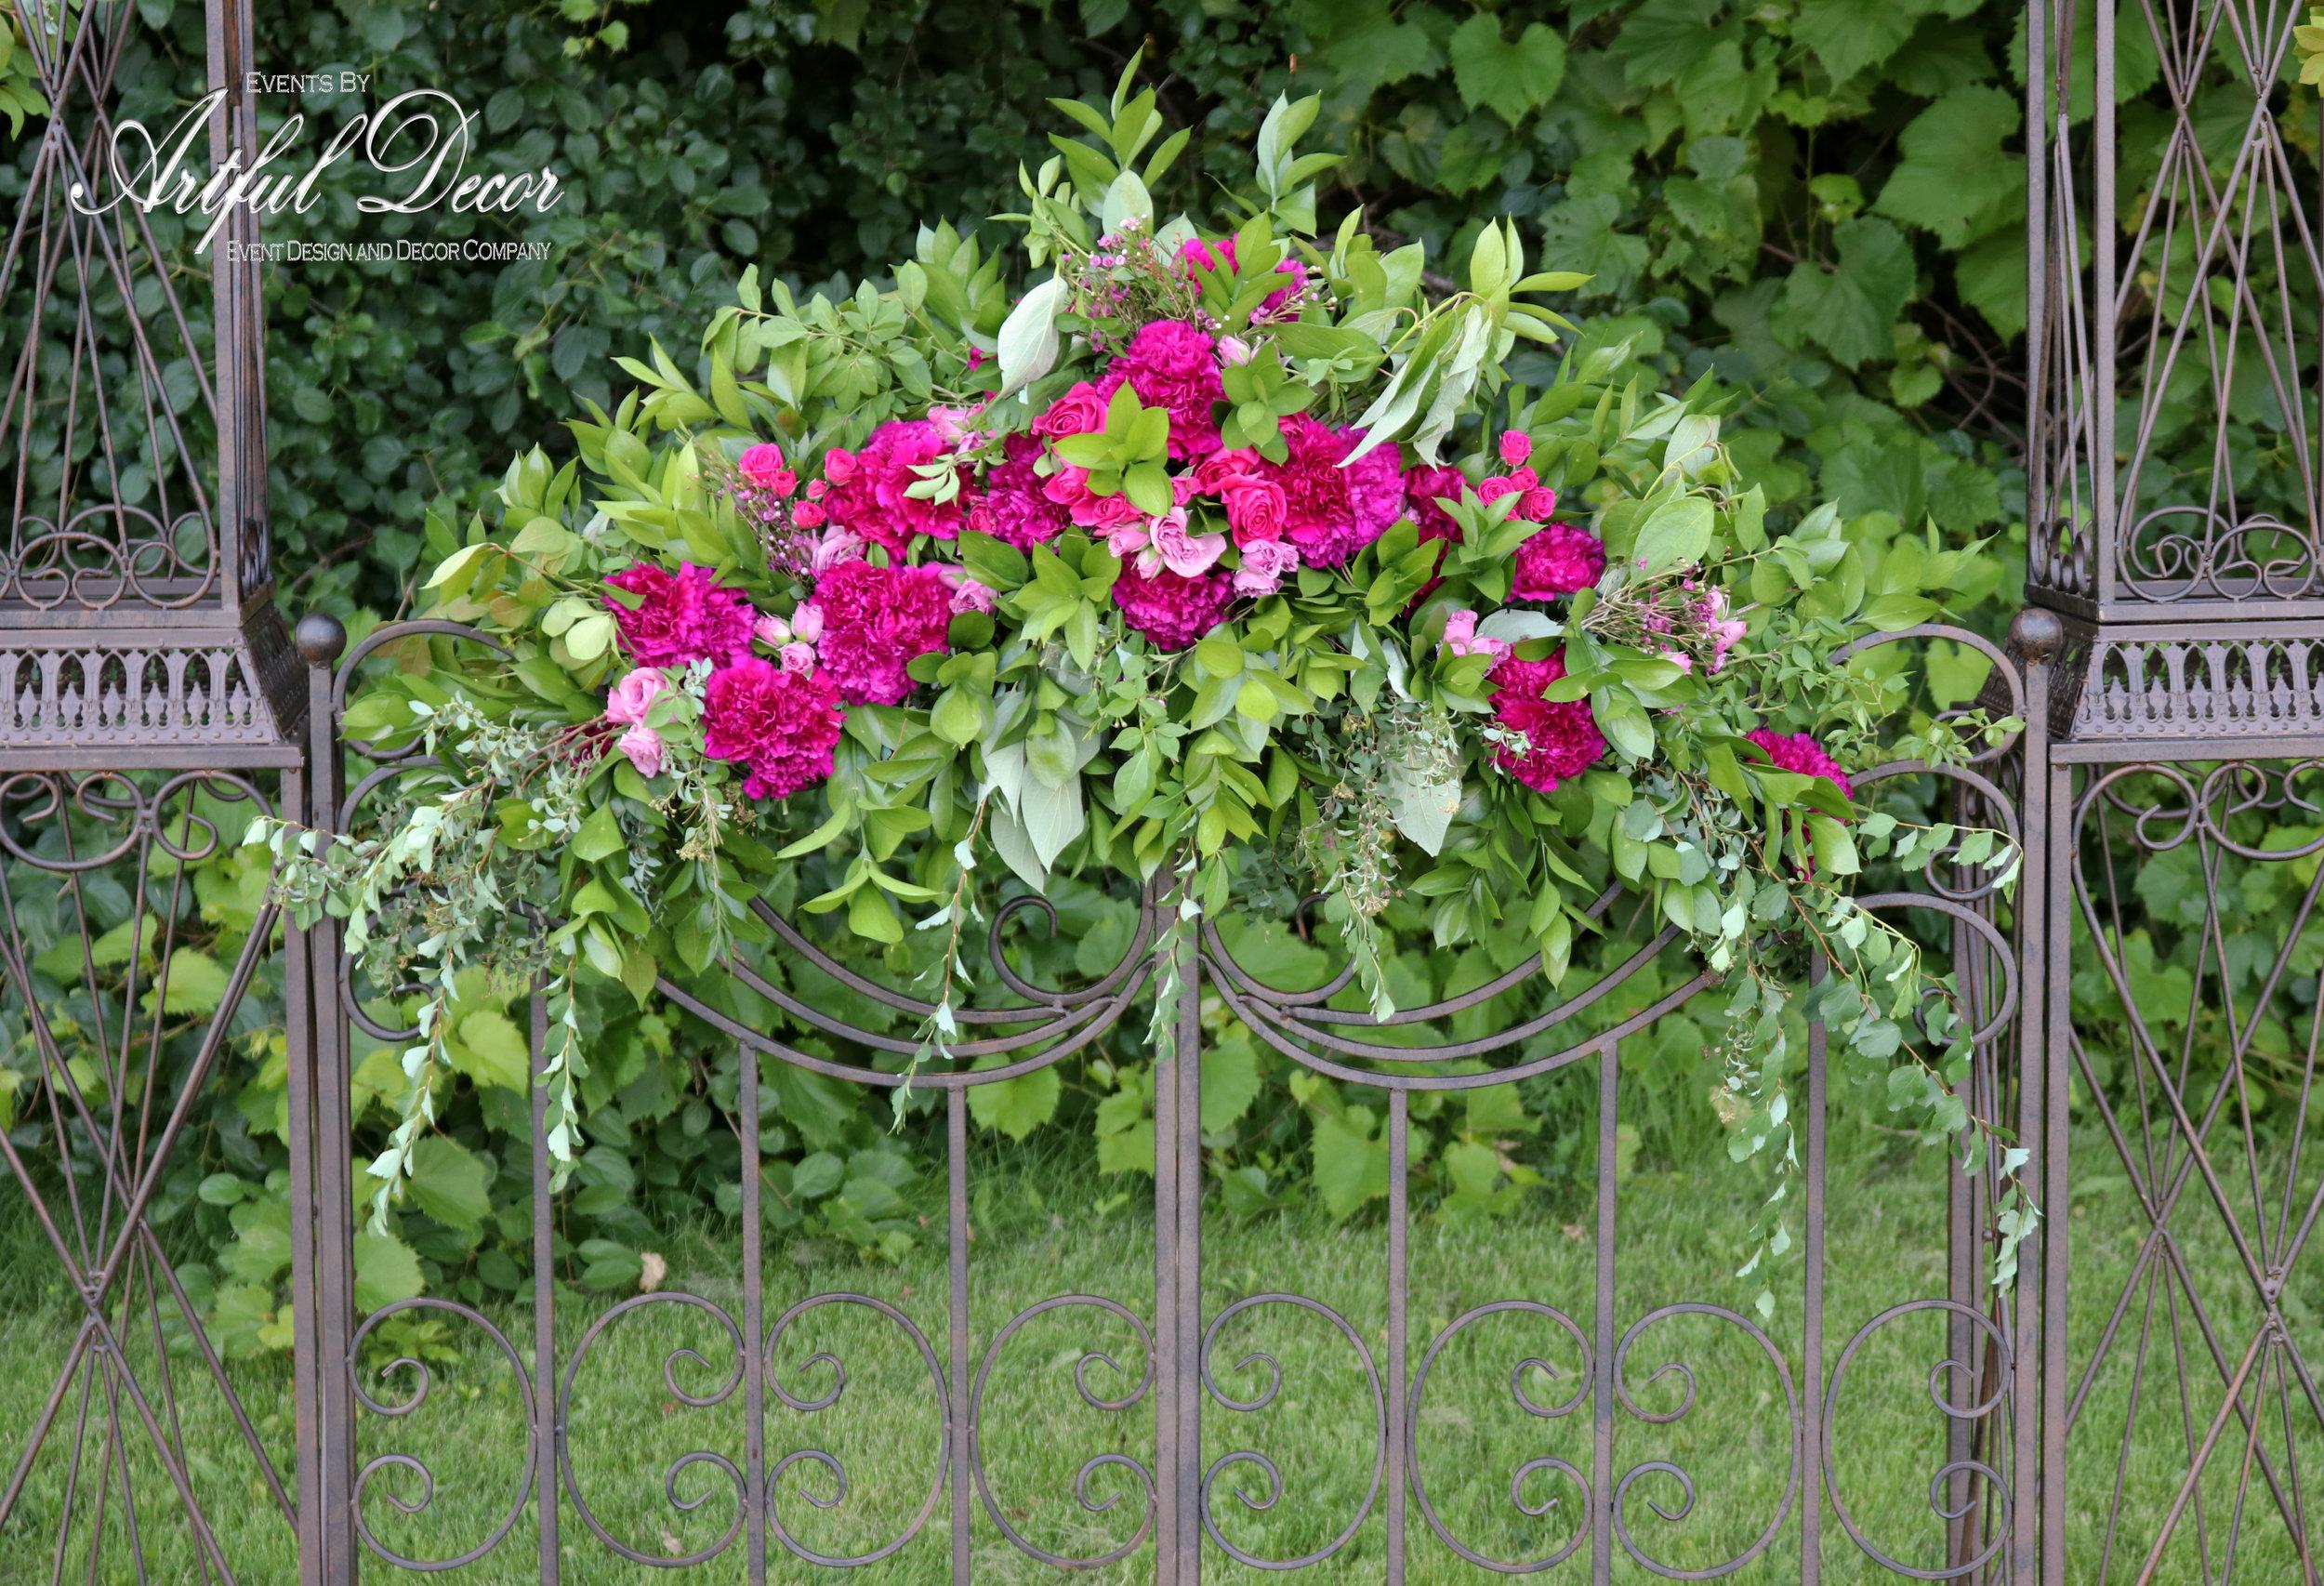 Garden Gate 26 Copyright.jpg